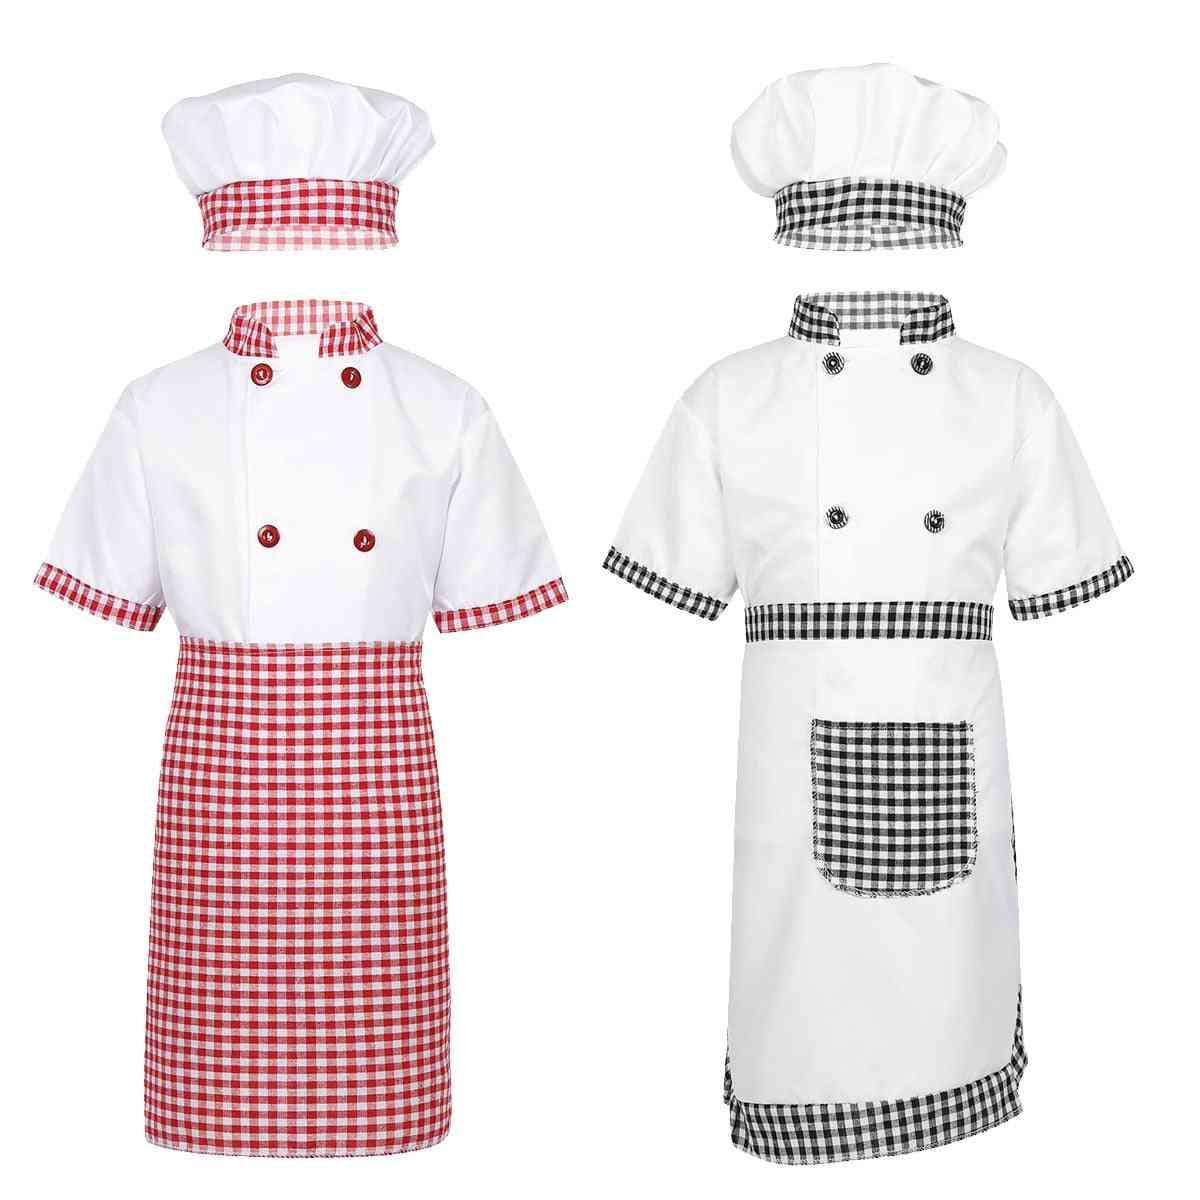 Tiaobug Unisex Chef Uniform Kids Chef Jacket With Apron Hat Kitchen Cook Cosplay Party Halloween Costume Set